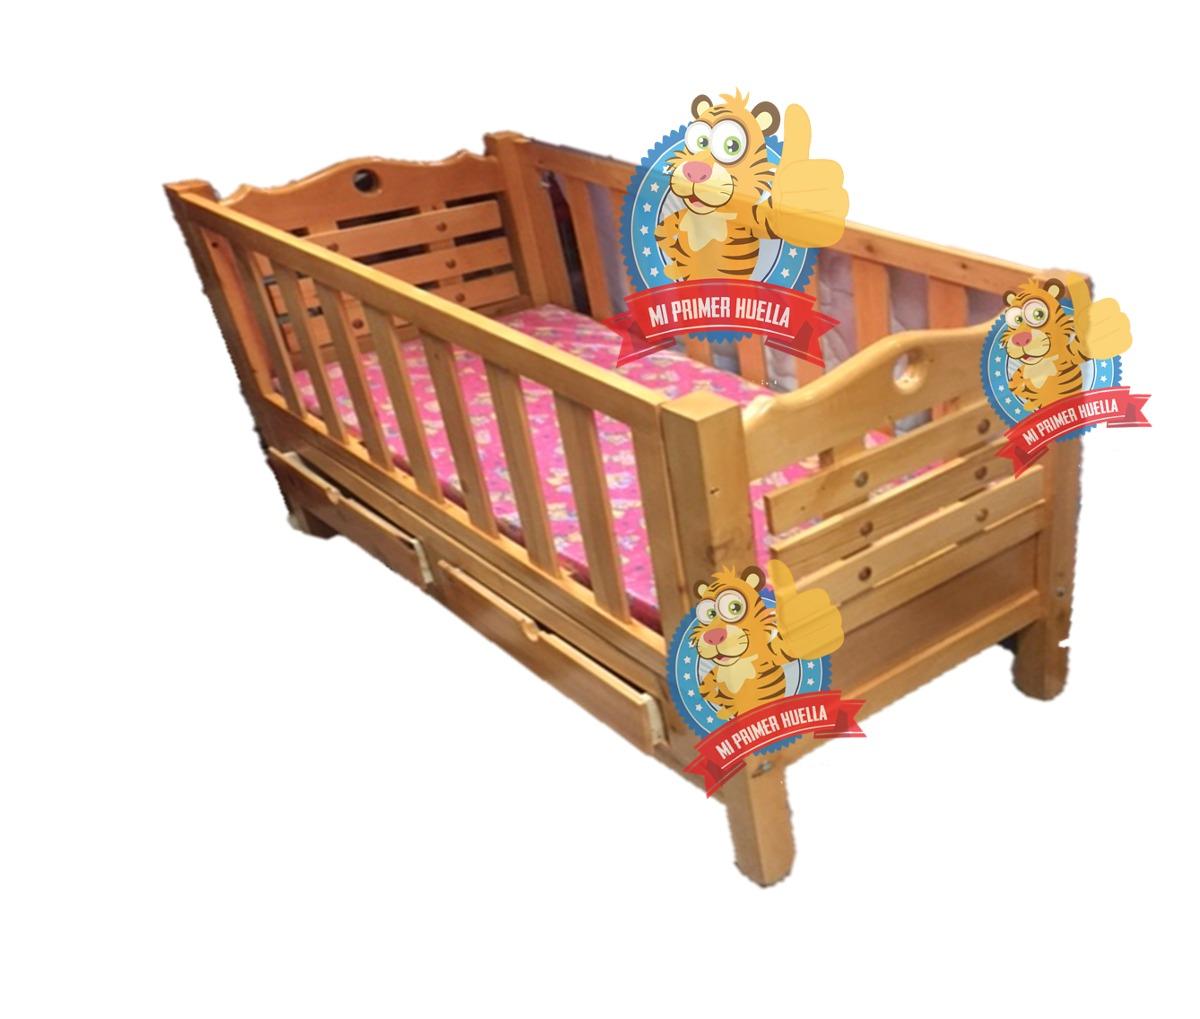 Cuna para bebe en madera 100 70 x de bebe cama cuna en mercado libre - Cuna cama para bebe ...